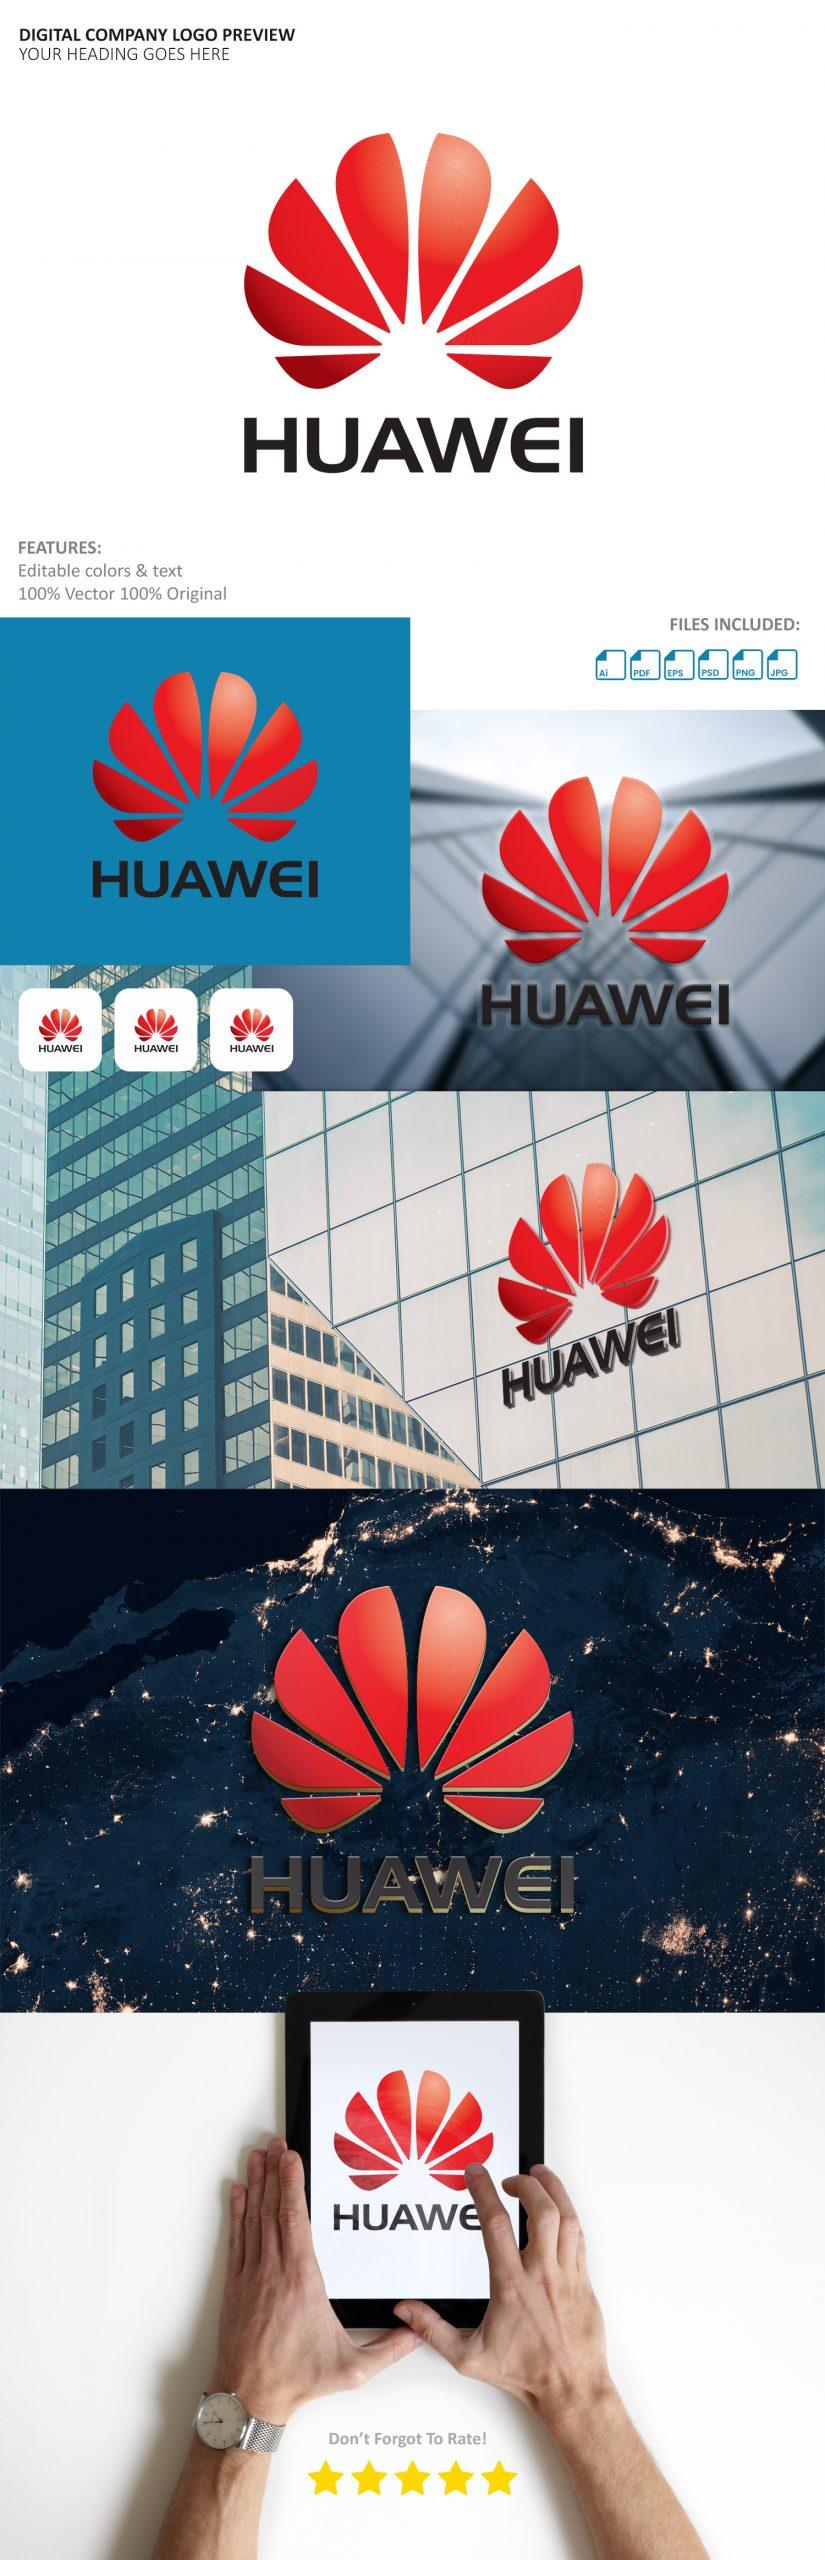 Free Digital Company Logo Preview Mockup